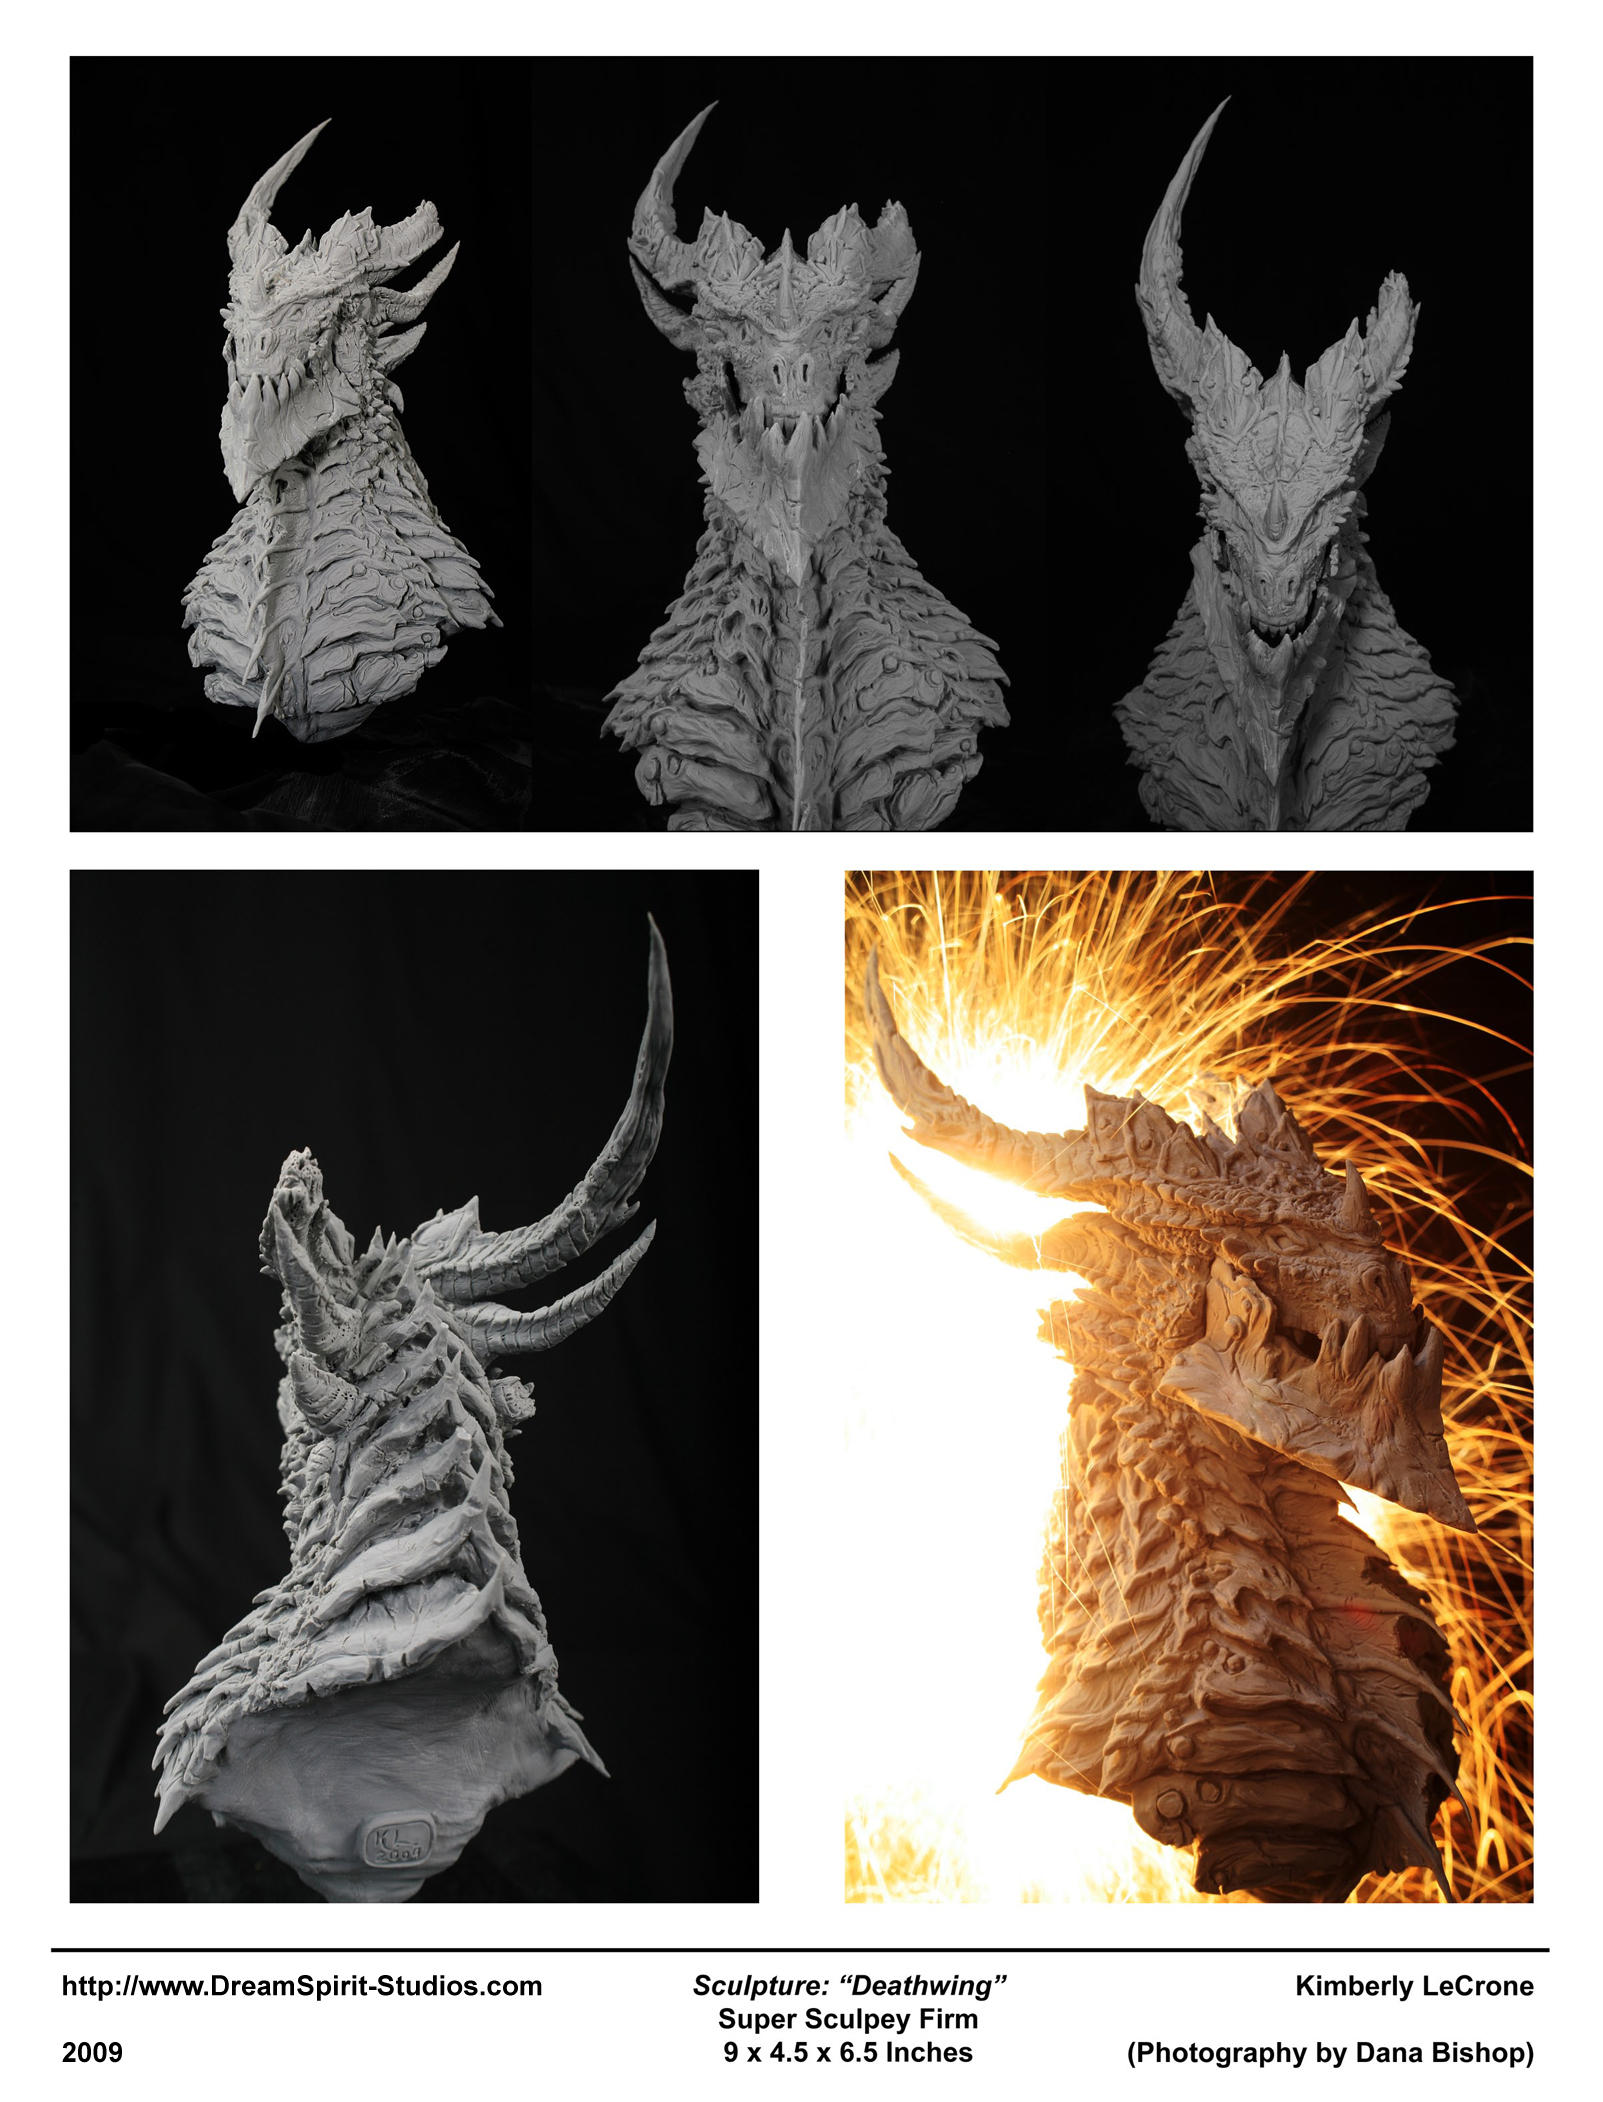 Deathwing Sculpture - 02 by Dreamspirit